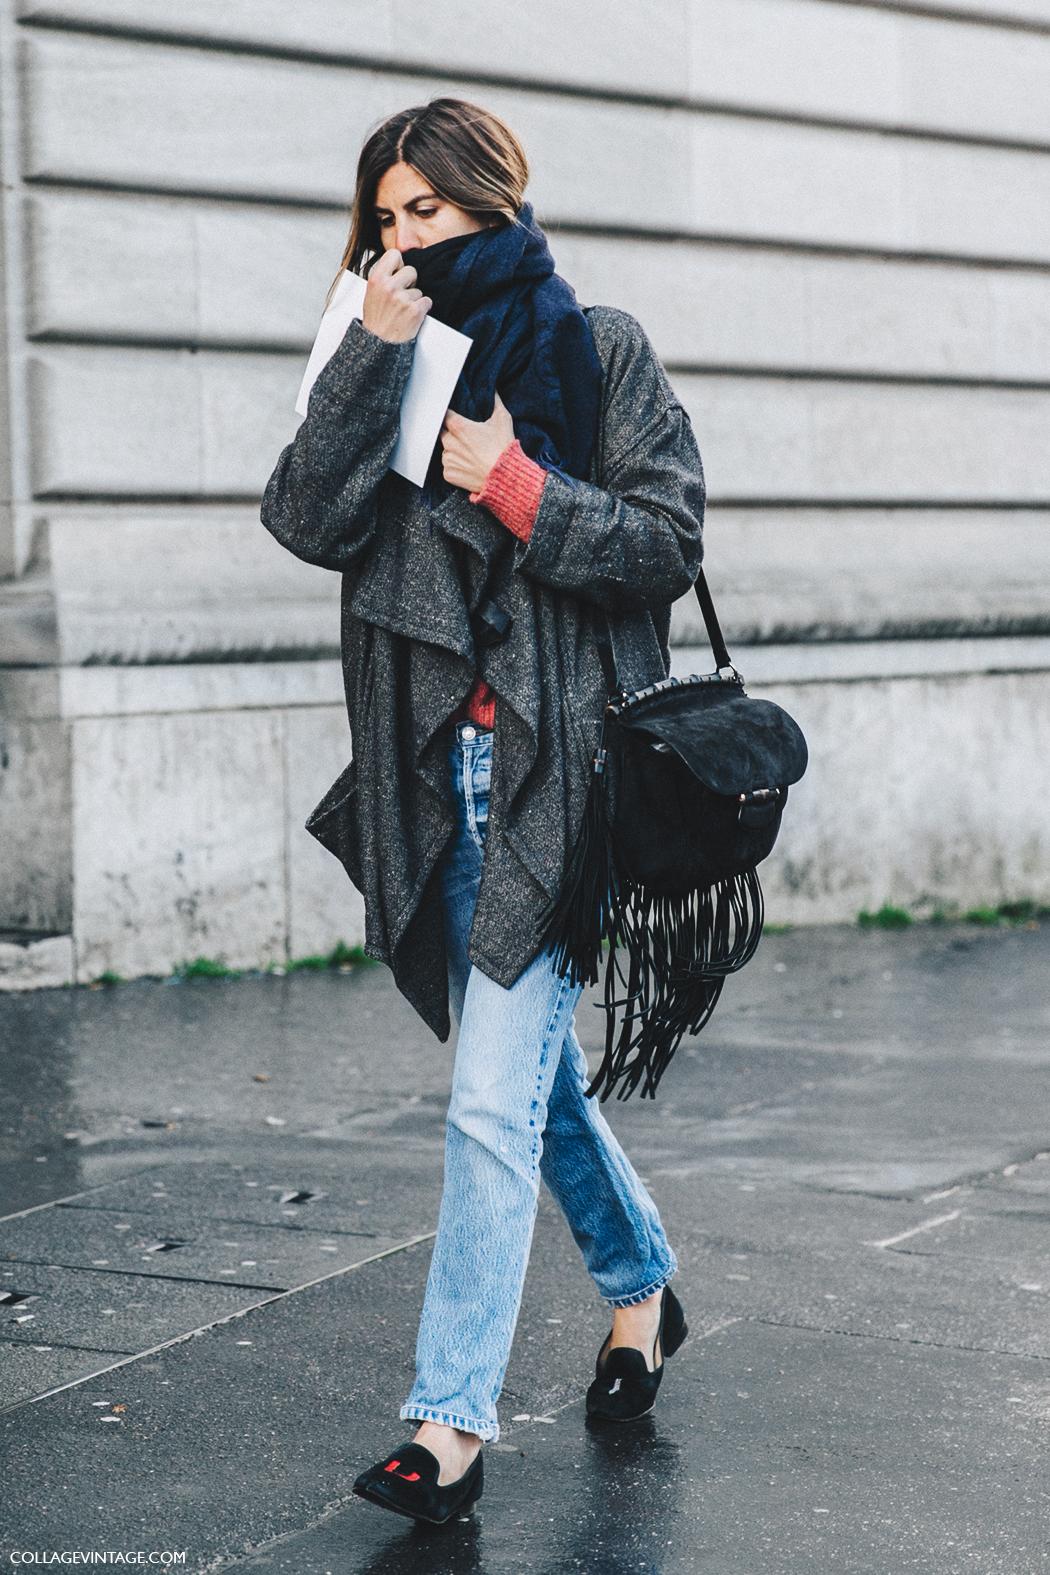 PFW-Paris_Fashion_Week_Fall_2016-Street_Style-Collage_Vintage-Gucci_Bag-Morganne-